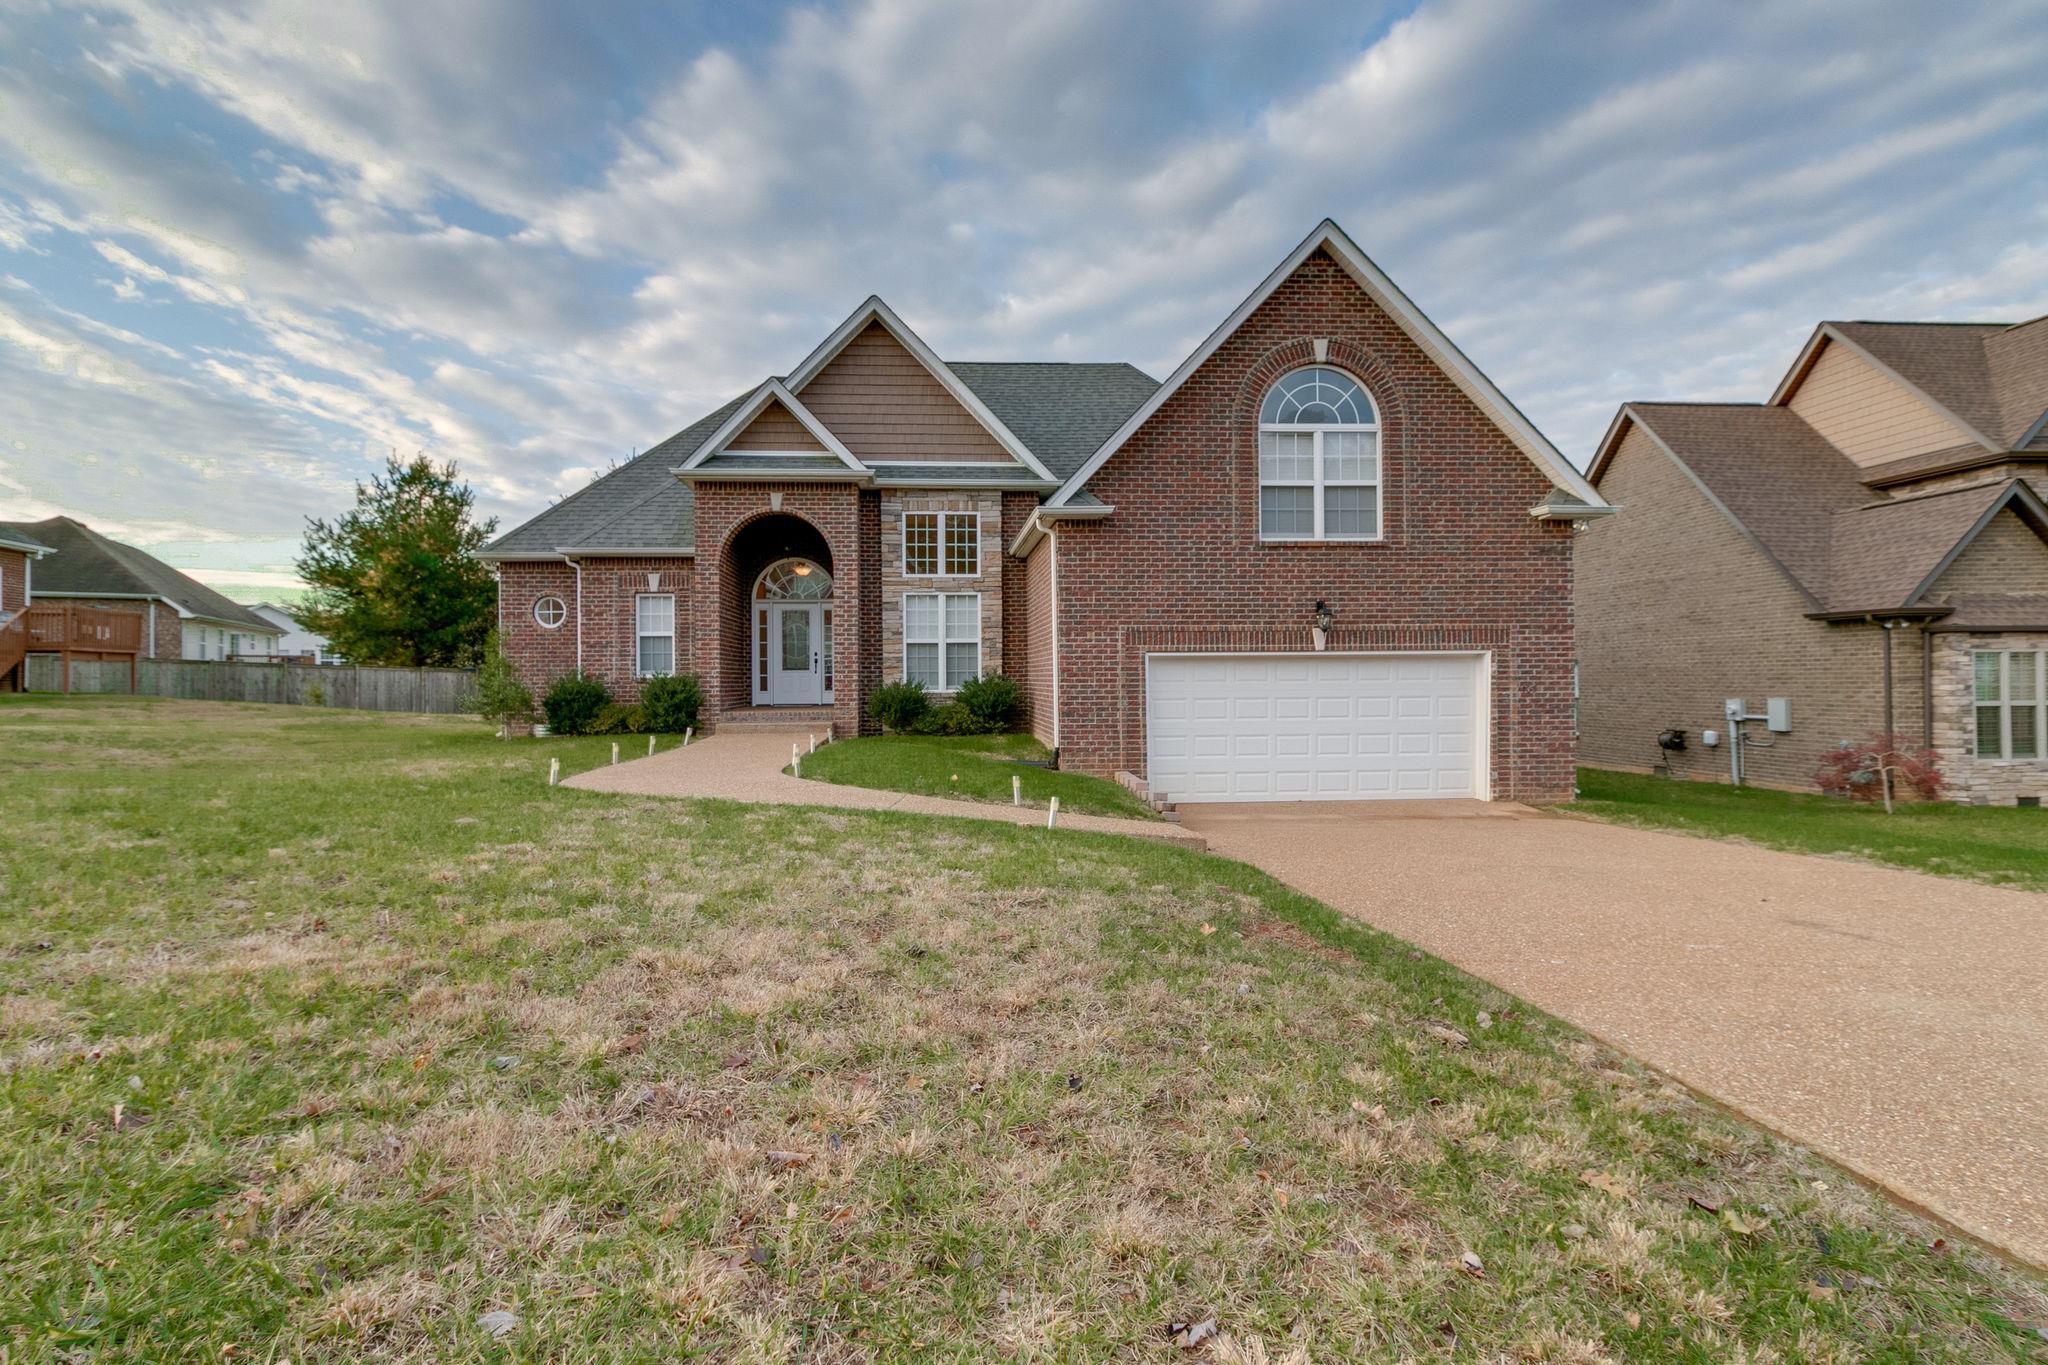 105 Landons Cir, White House, TN 37188 - White House, TN real estate listing